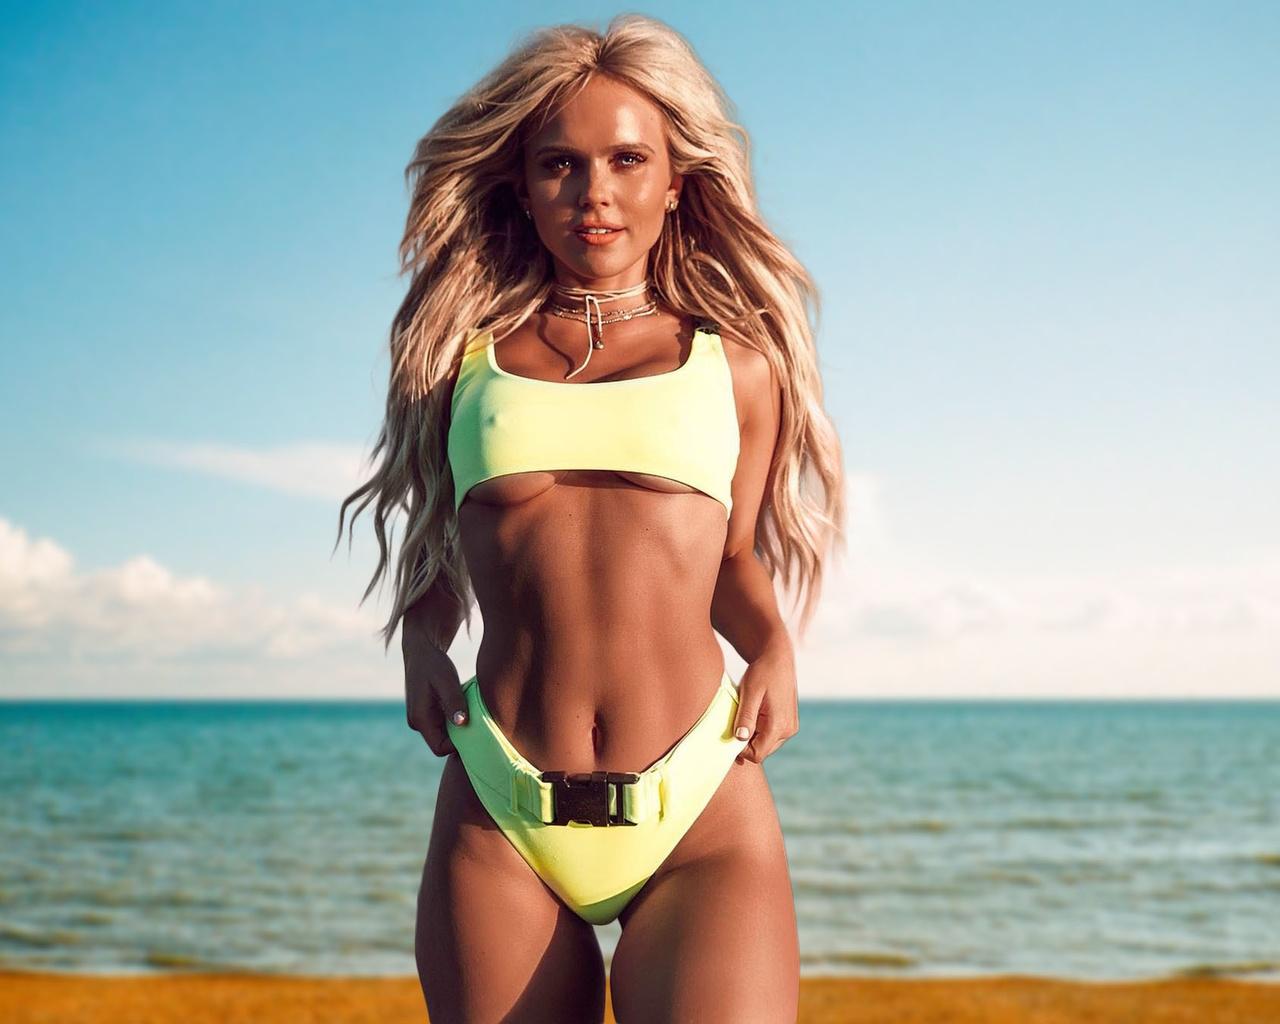 girl, blonde, beautiful, sexy, cute, perfect, bikini, hips, pretty, long hair, beauty, tanned, boobs, model, beach, hilde osland